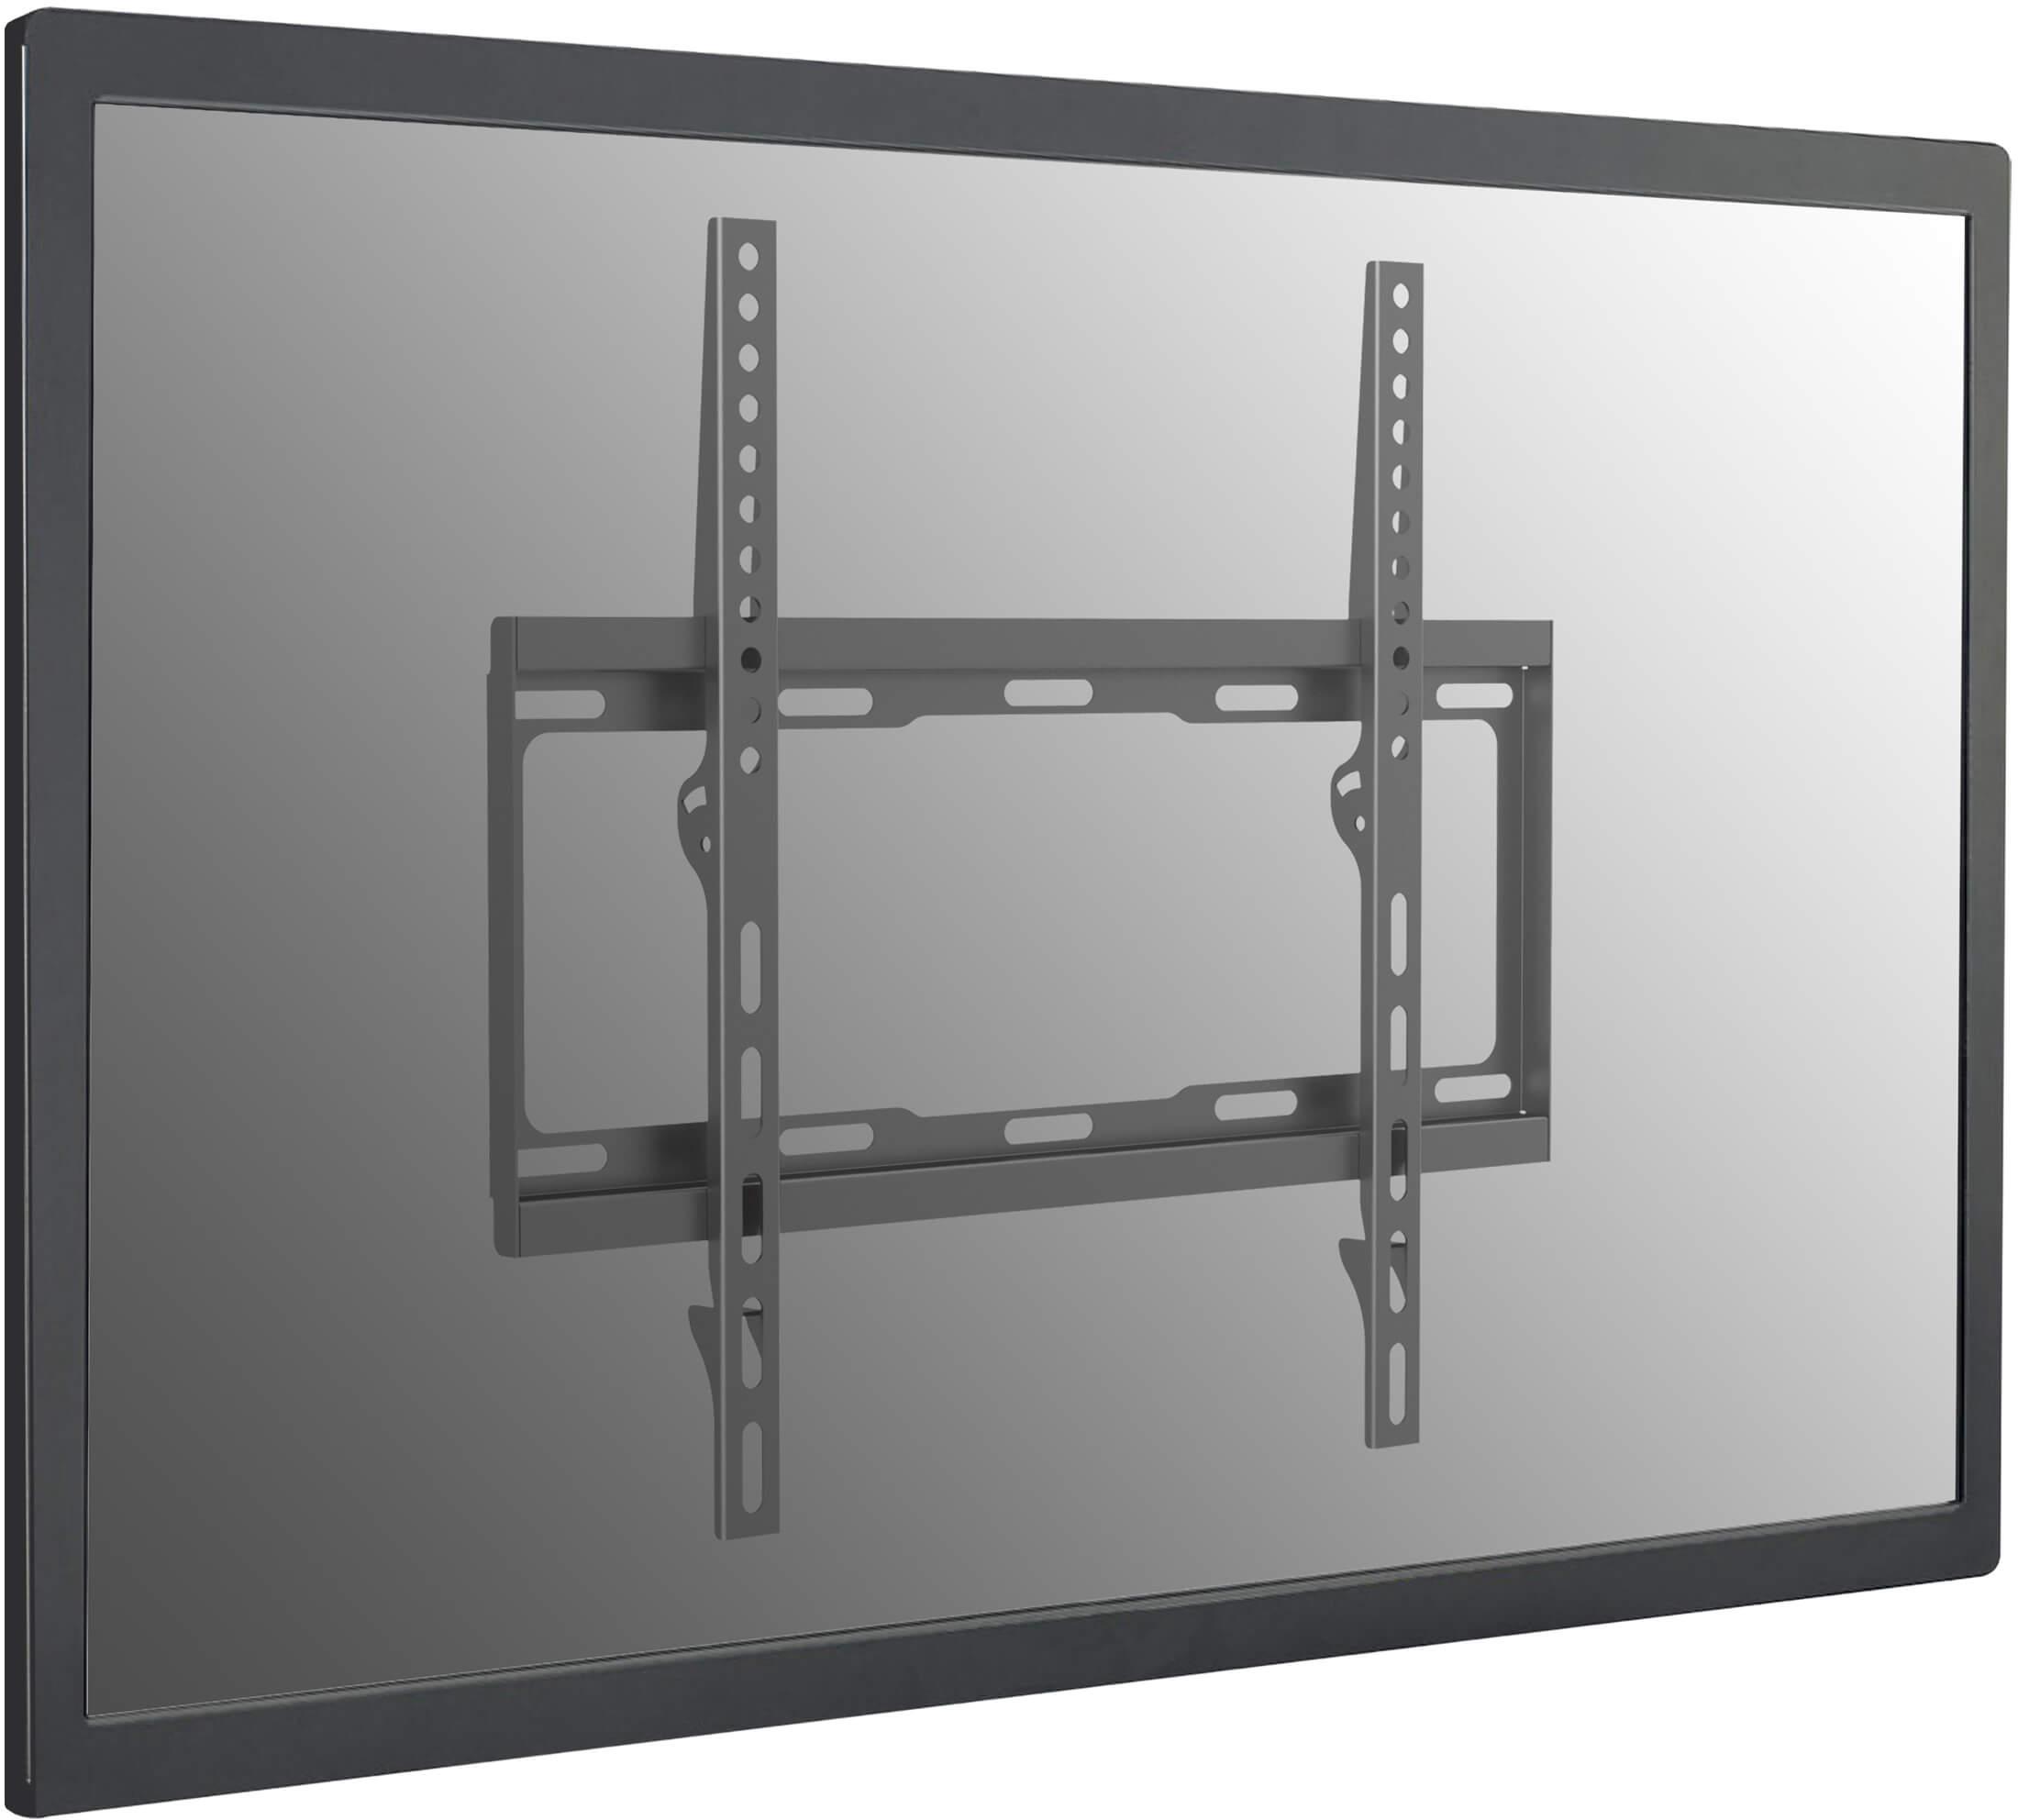 "Equip - Suporte de Parede 32"" a 55"" Equip Flat Screen Fixo"